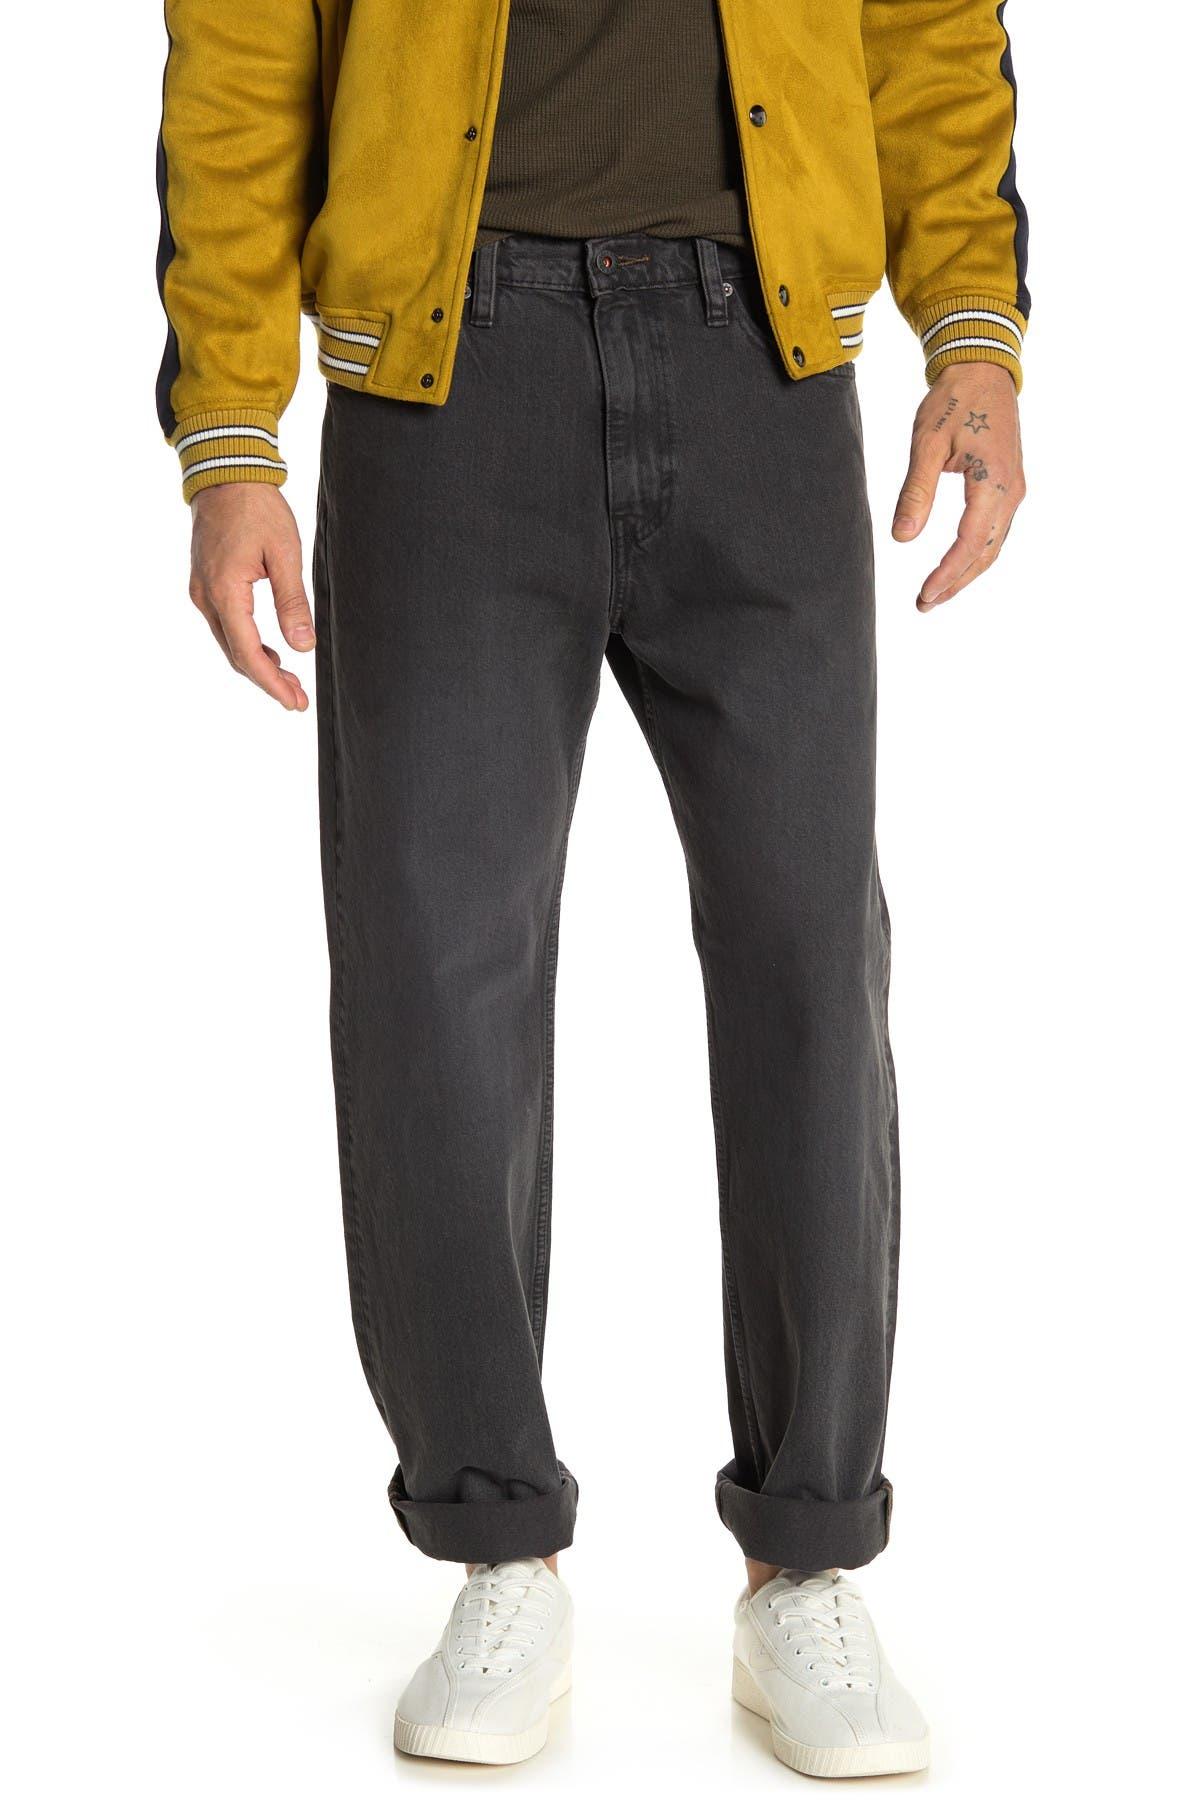 "Image of Levi's Skateboarding 5 Pocket Jeans - 30-34"" Inseam"